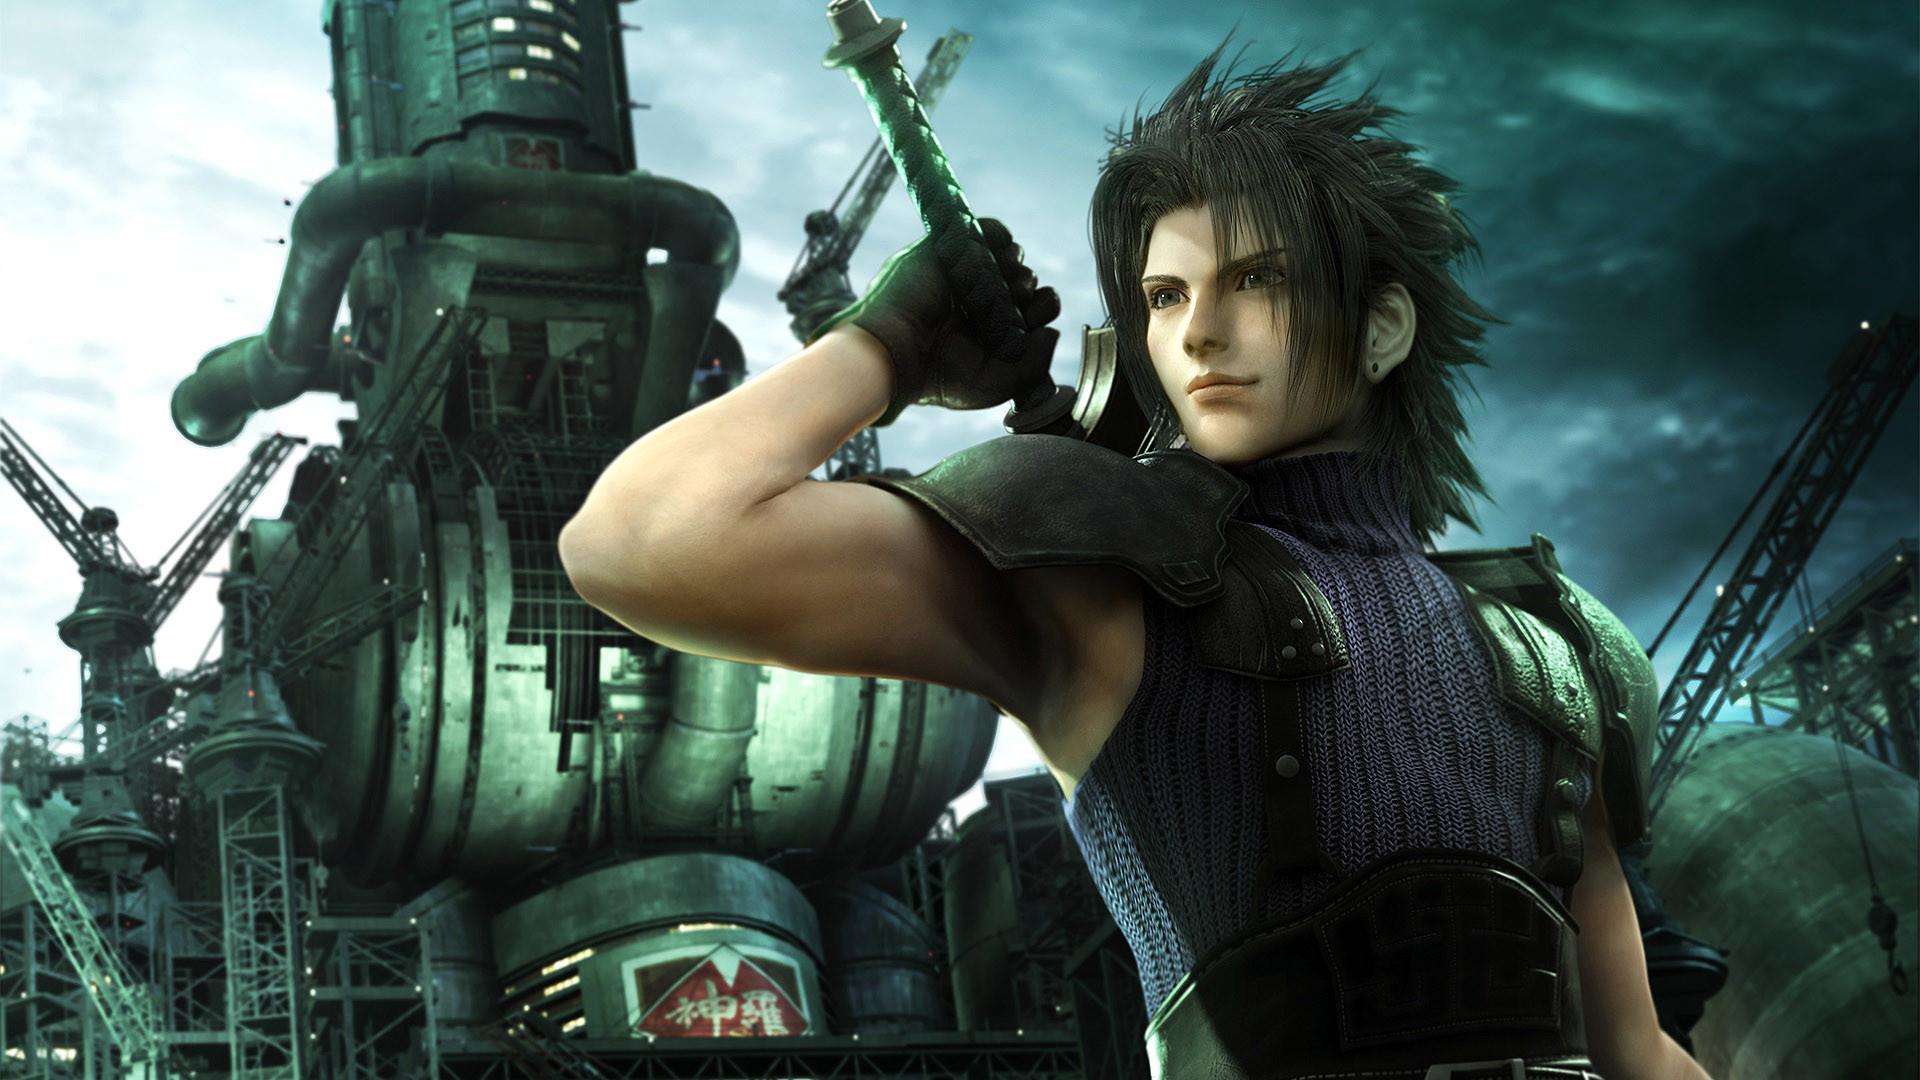 Final Fantasy HD Wallpaper 16400